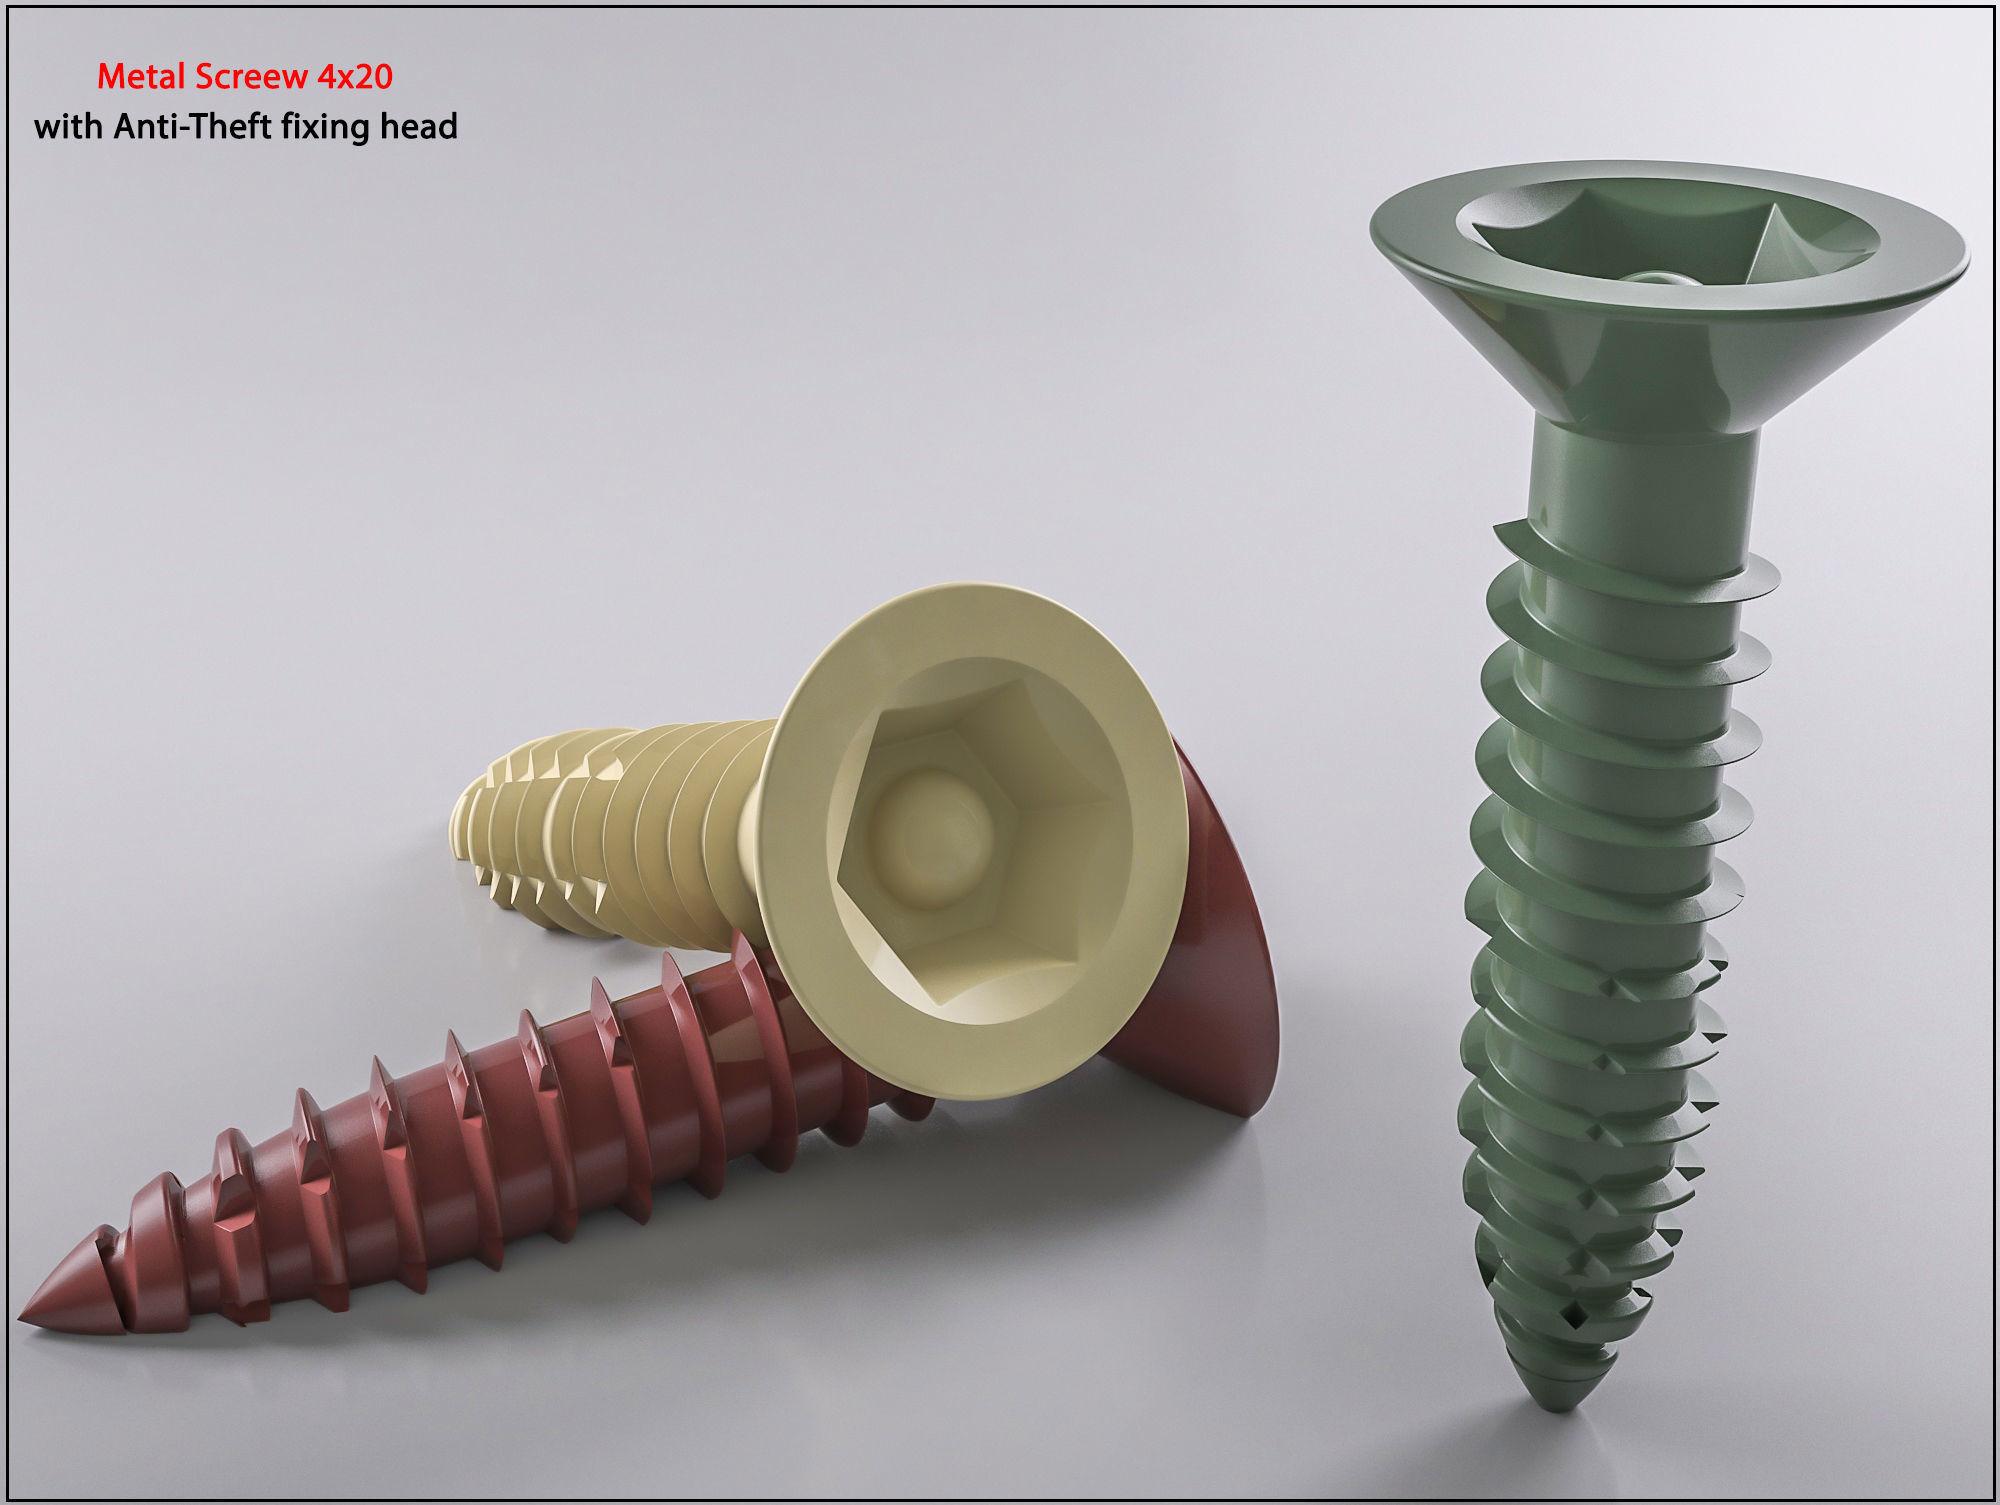 3D Screw  Metal Screw 4x20 Original Sizes Ready for 3D Print